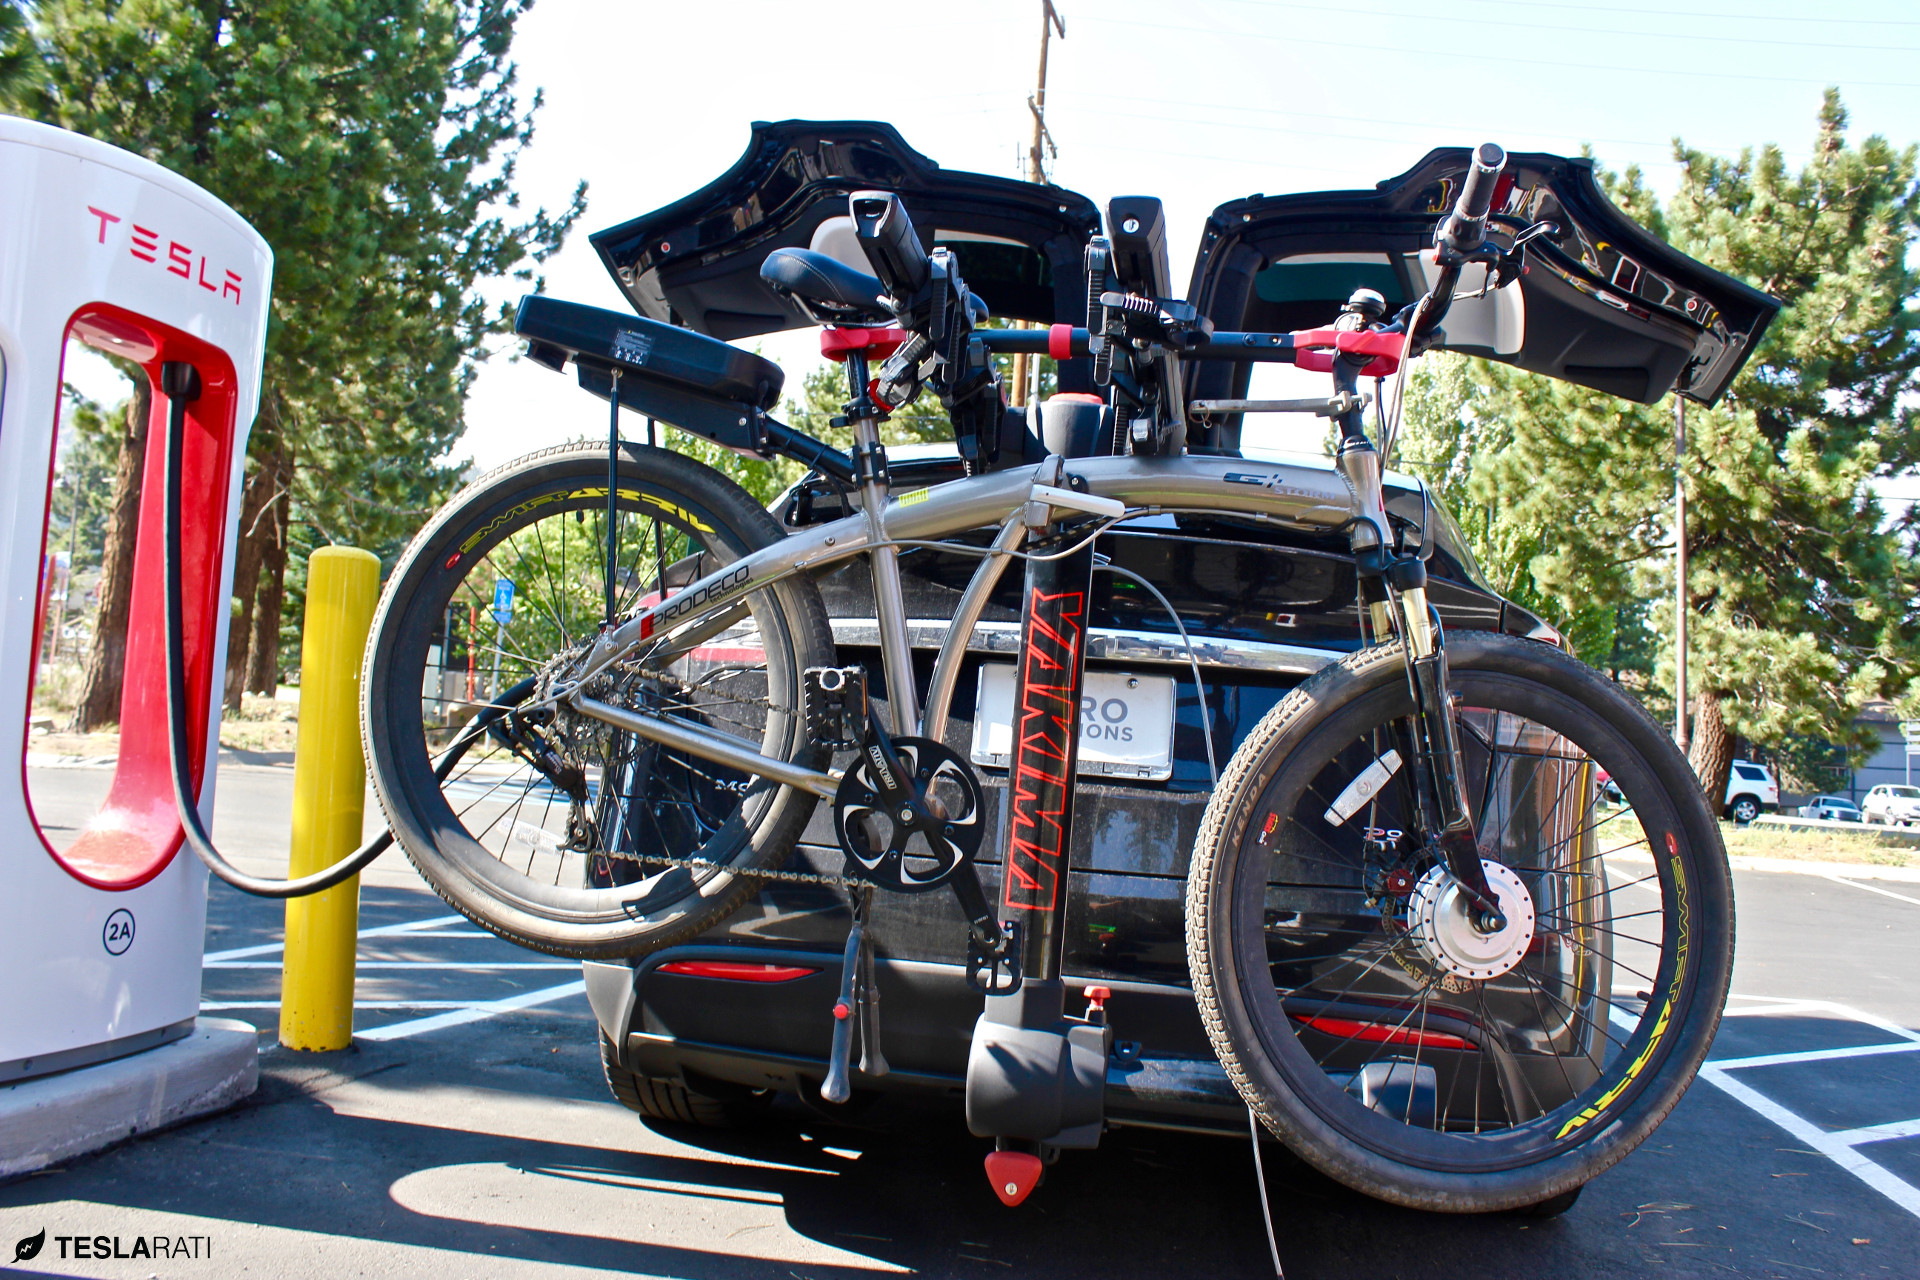 installing a tesla model x bike rack once you go fullswing you can t go back